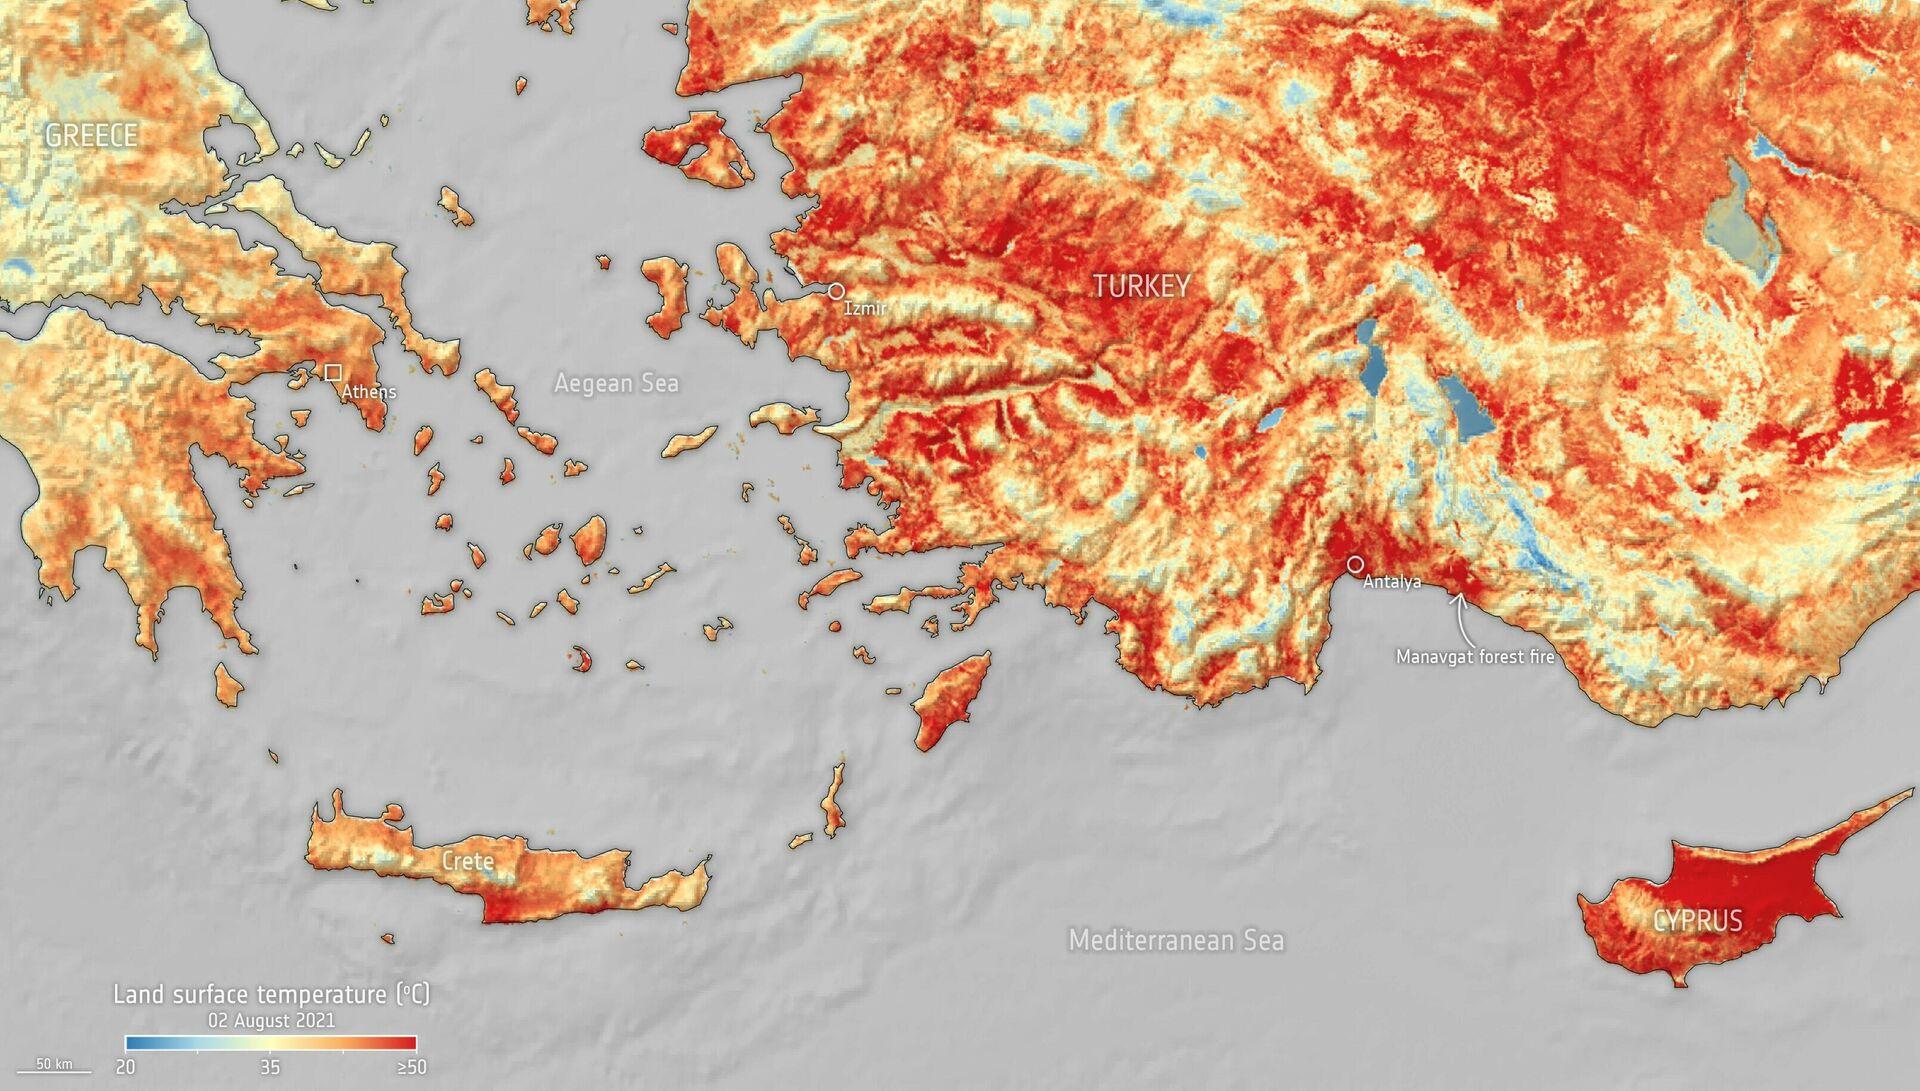 El Mediterráneo se cuece - Sputnik Mundo, 1920, 06.08.2021